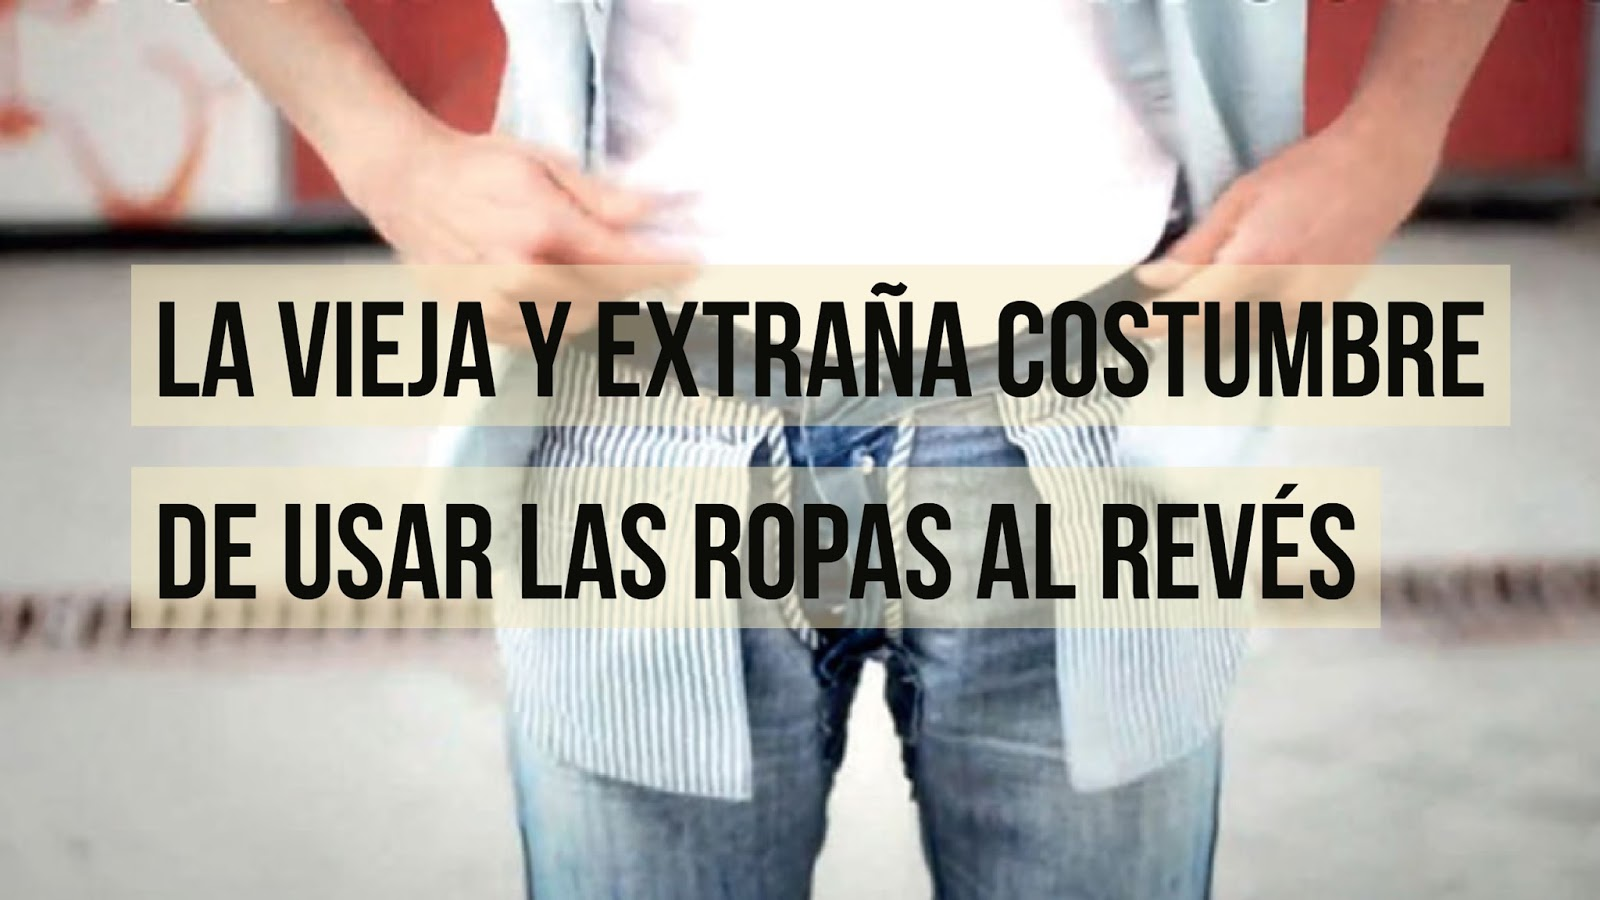 6eb0e0a3cc La Vieja y Extraña Costumbre de usar las Ropas al Revés ~ El Salvador  Región Magica